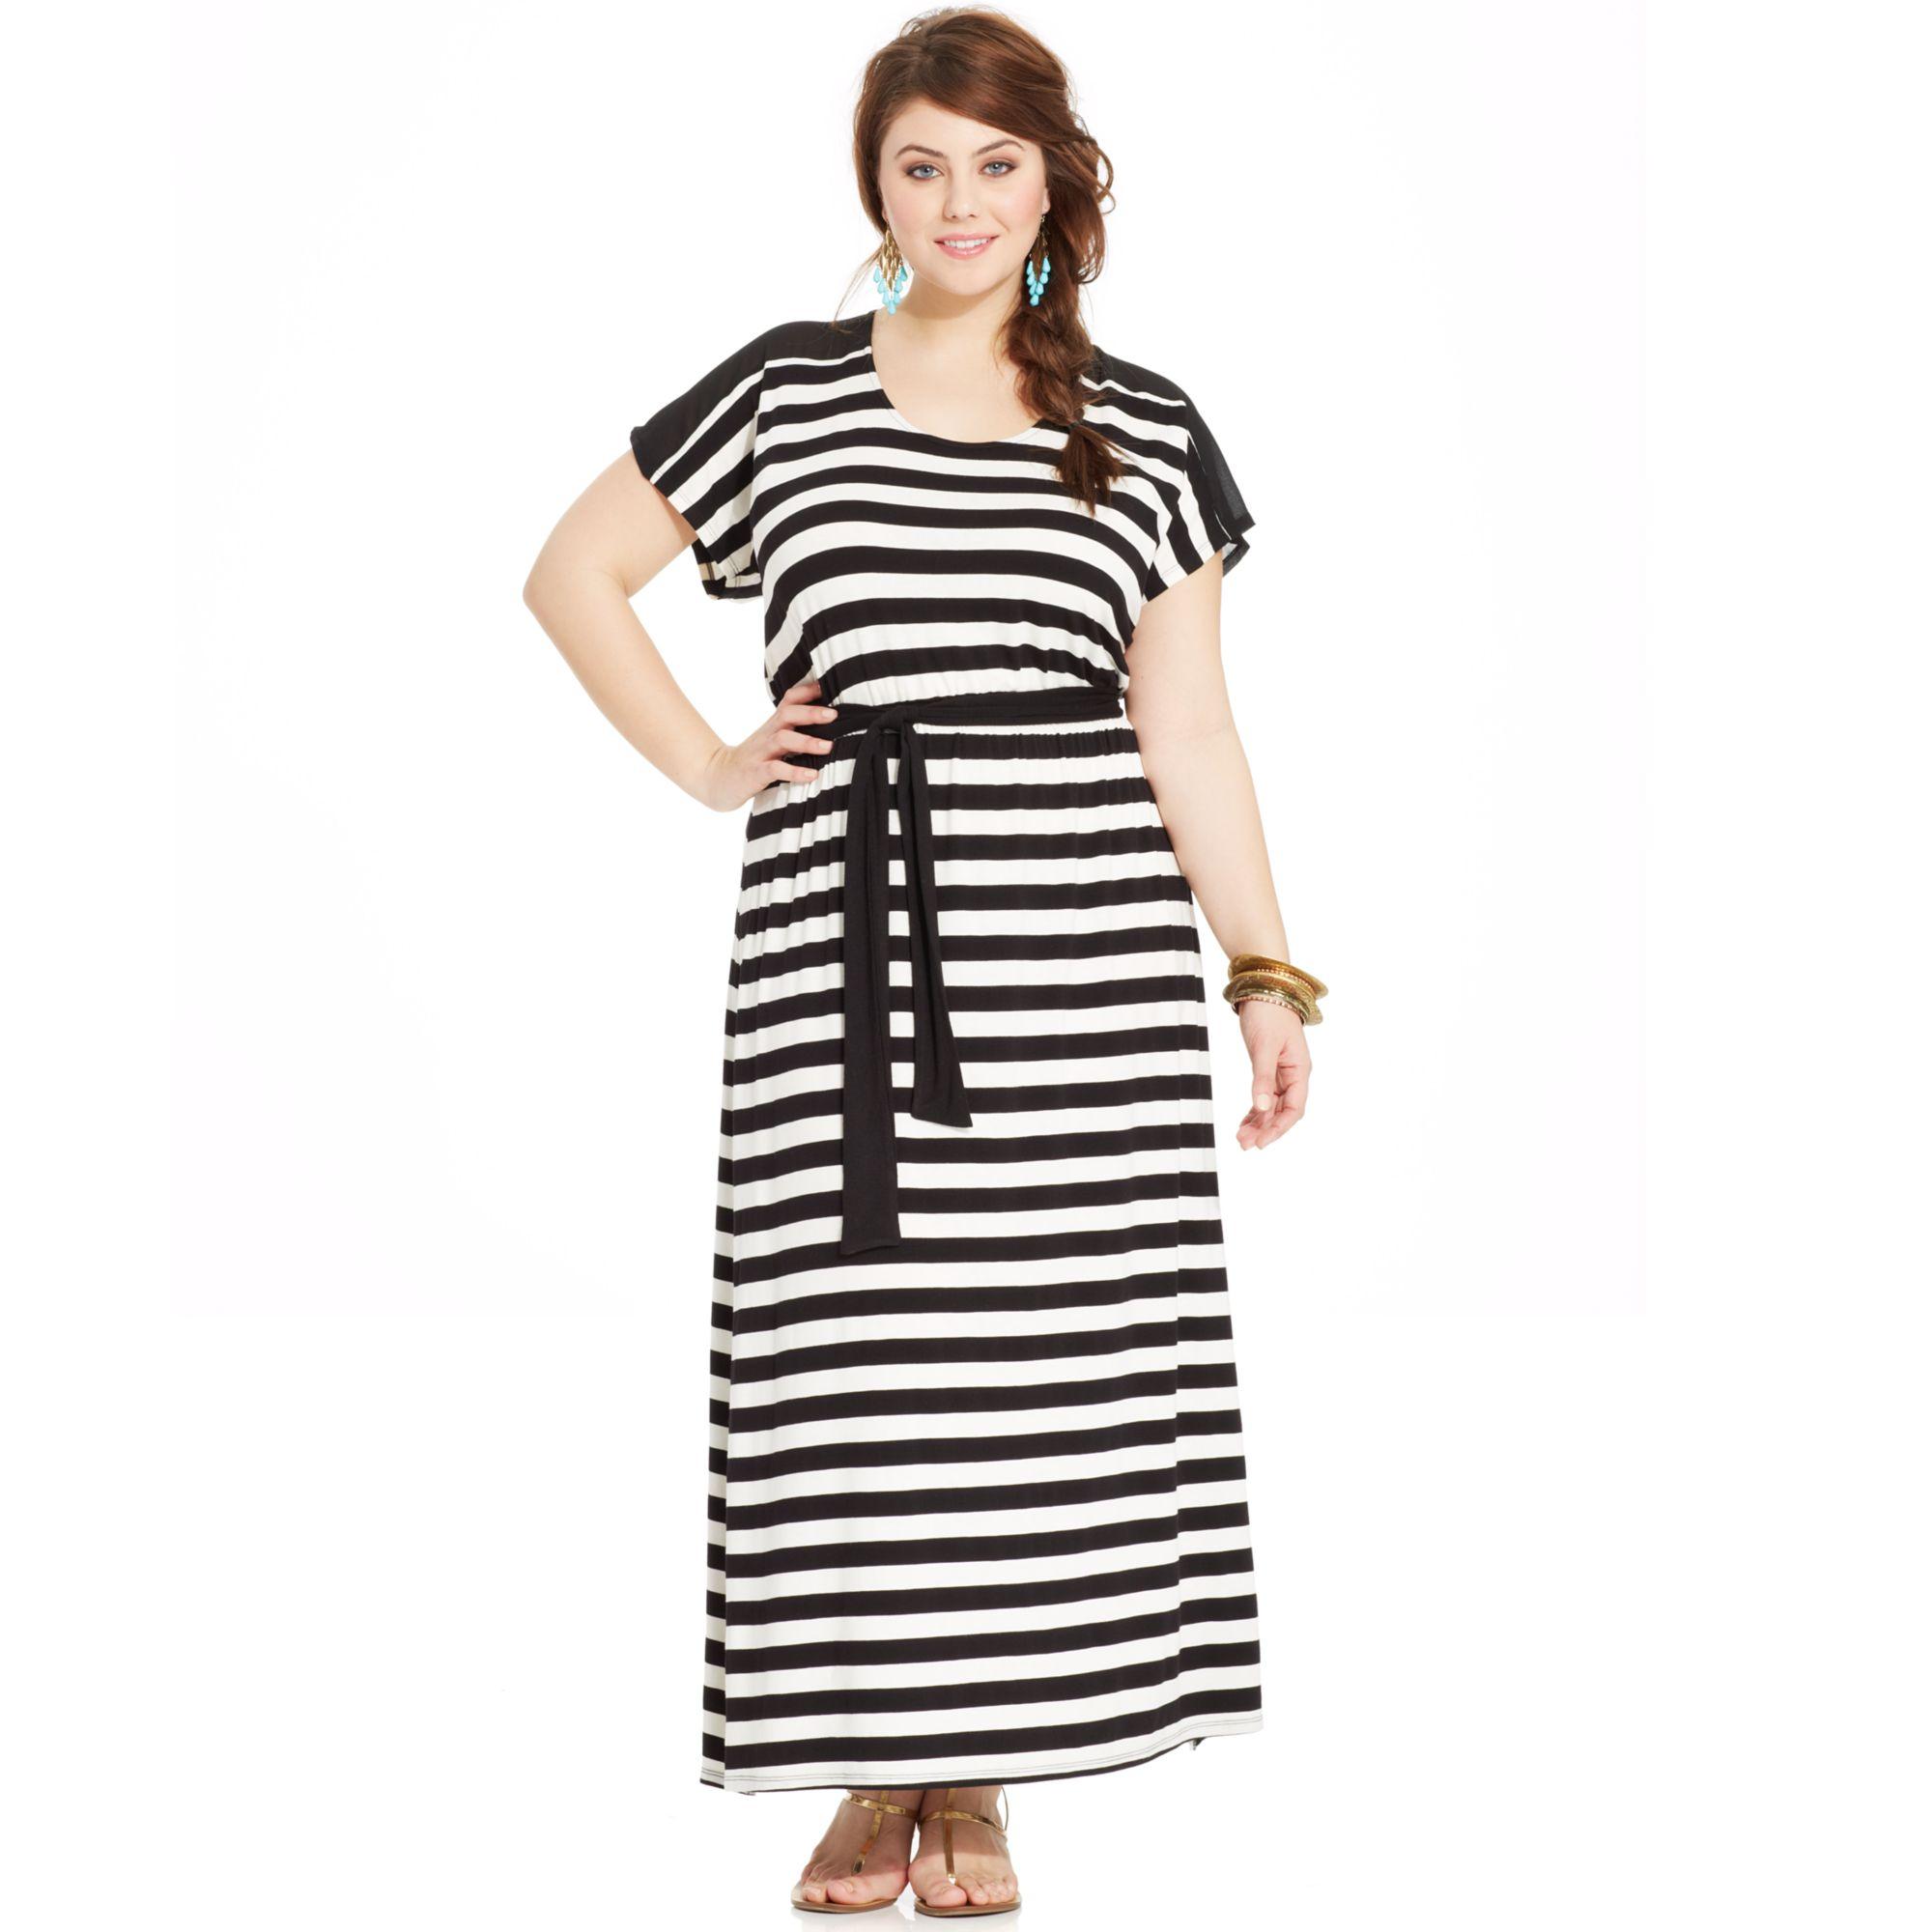 Lyst - American rag Plus Size Striped Cutoutback Maxi Dress in Black